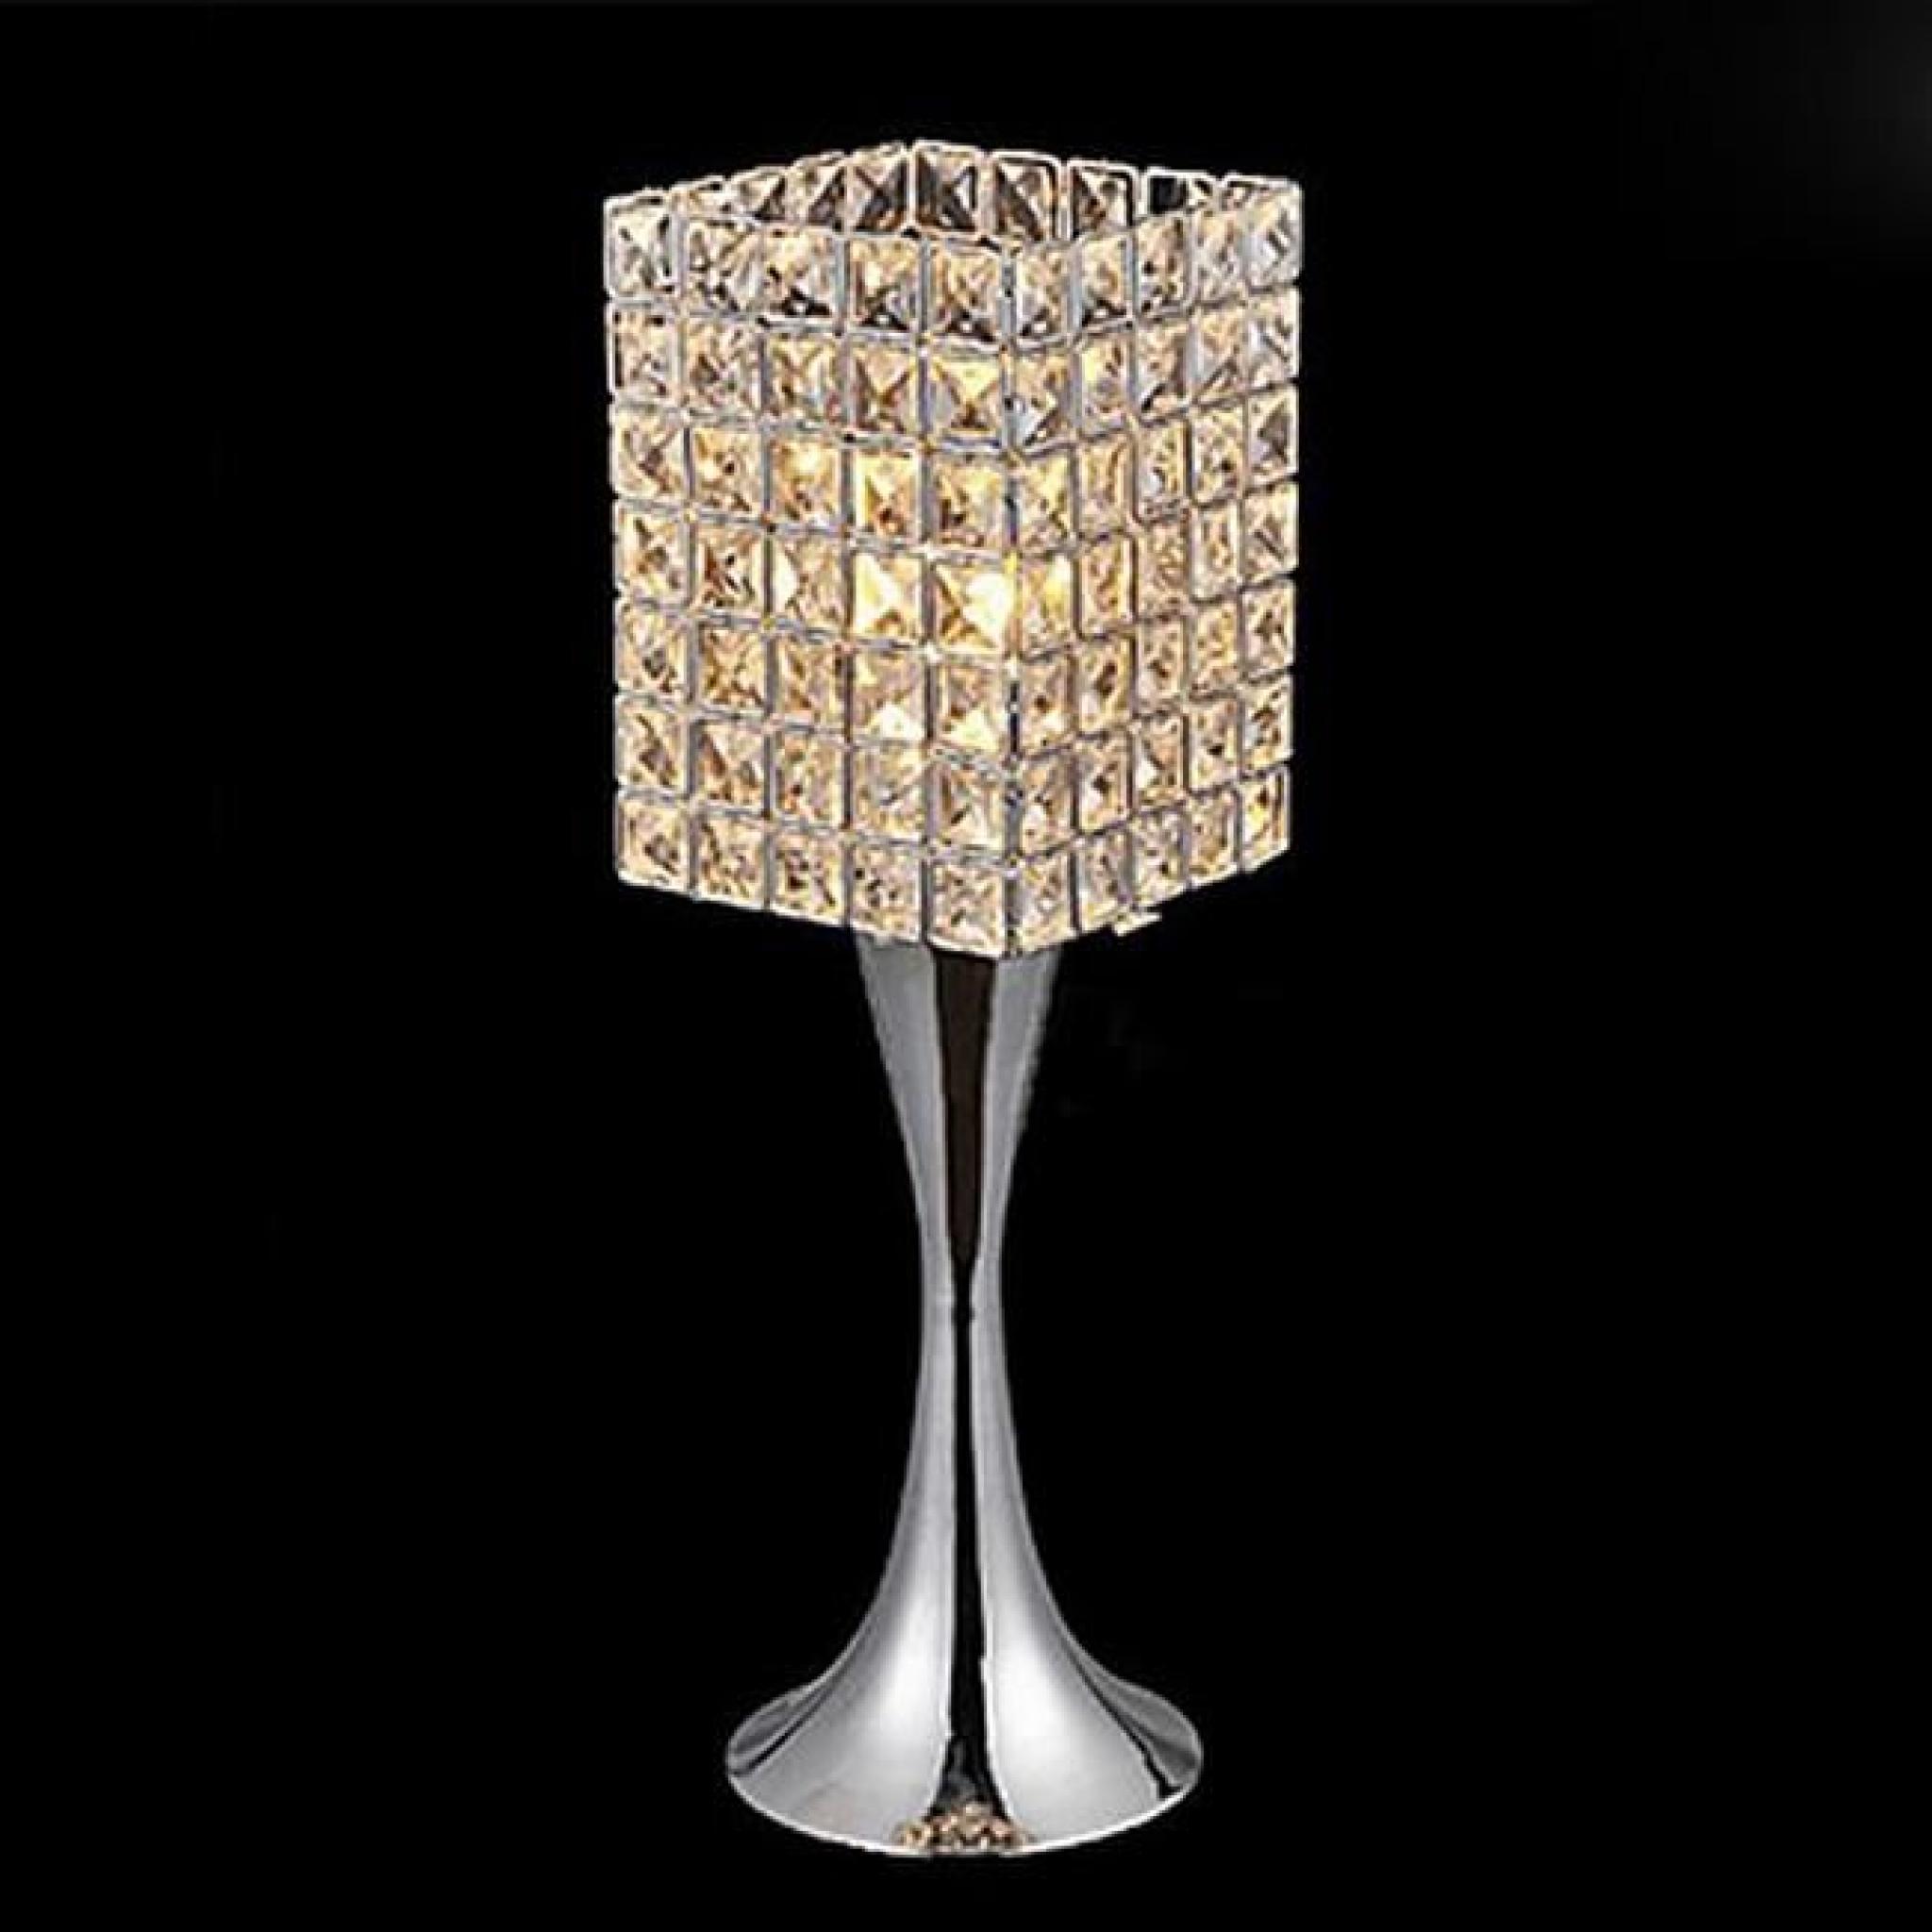 lampe de table en cristal tu achat vente lampe a poser. Black Bedroom Furniture Sets. Home Design Ideas